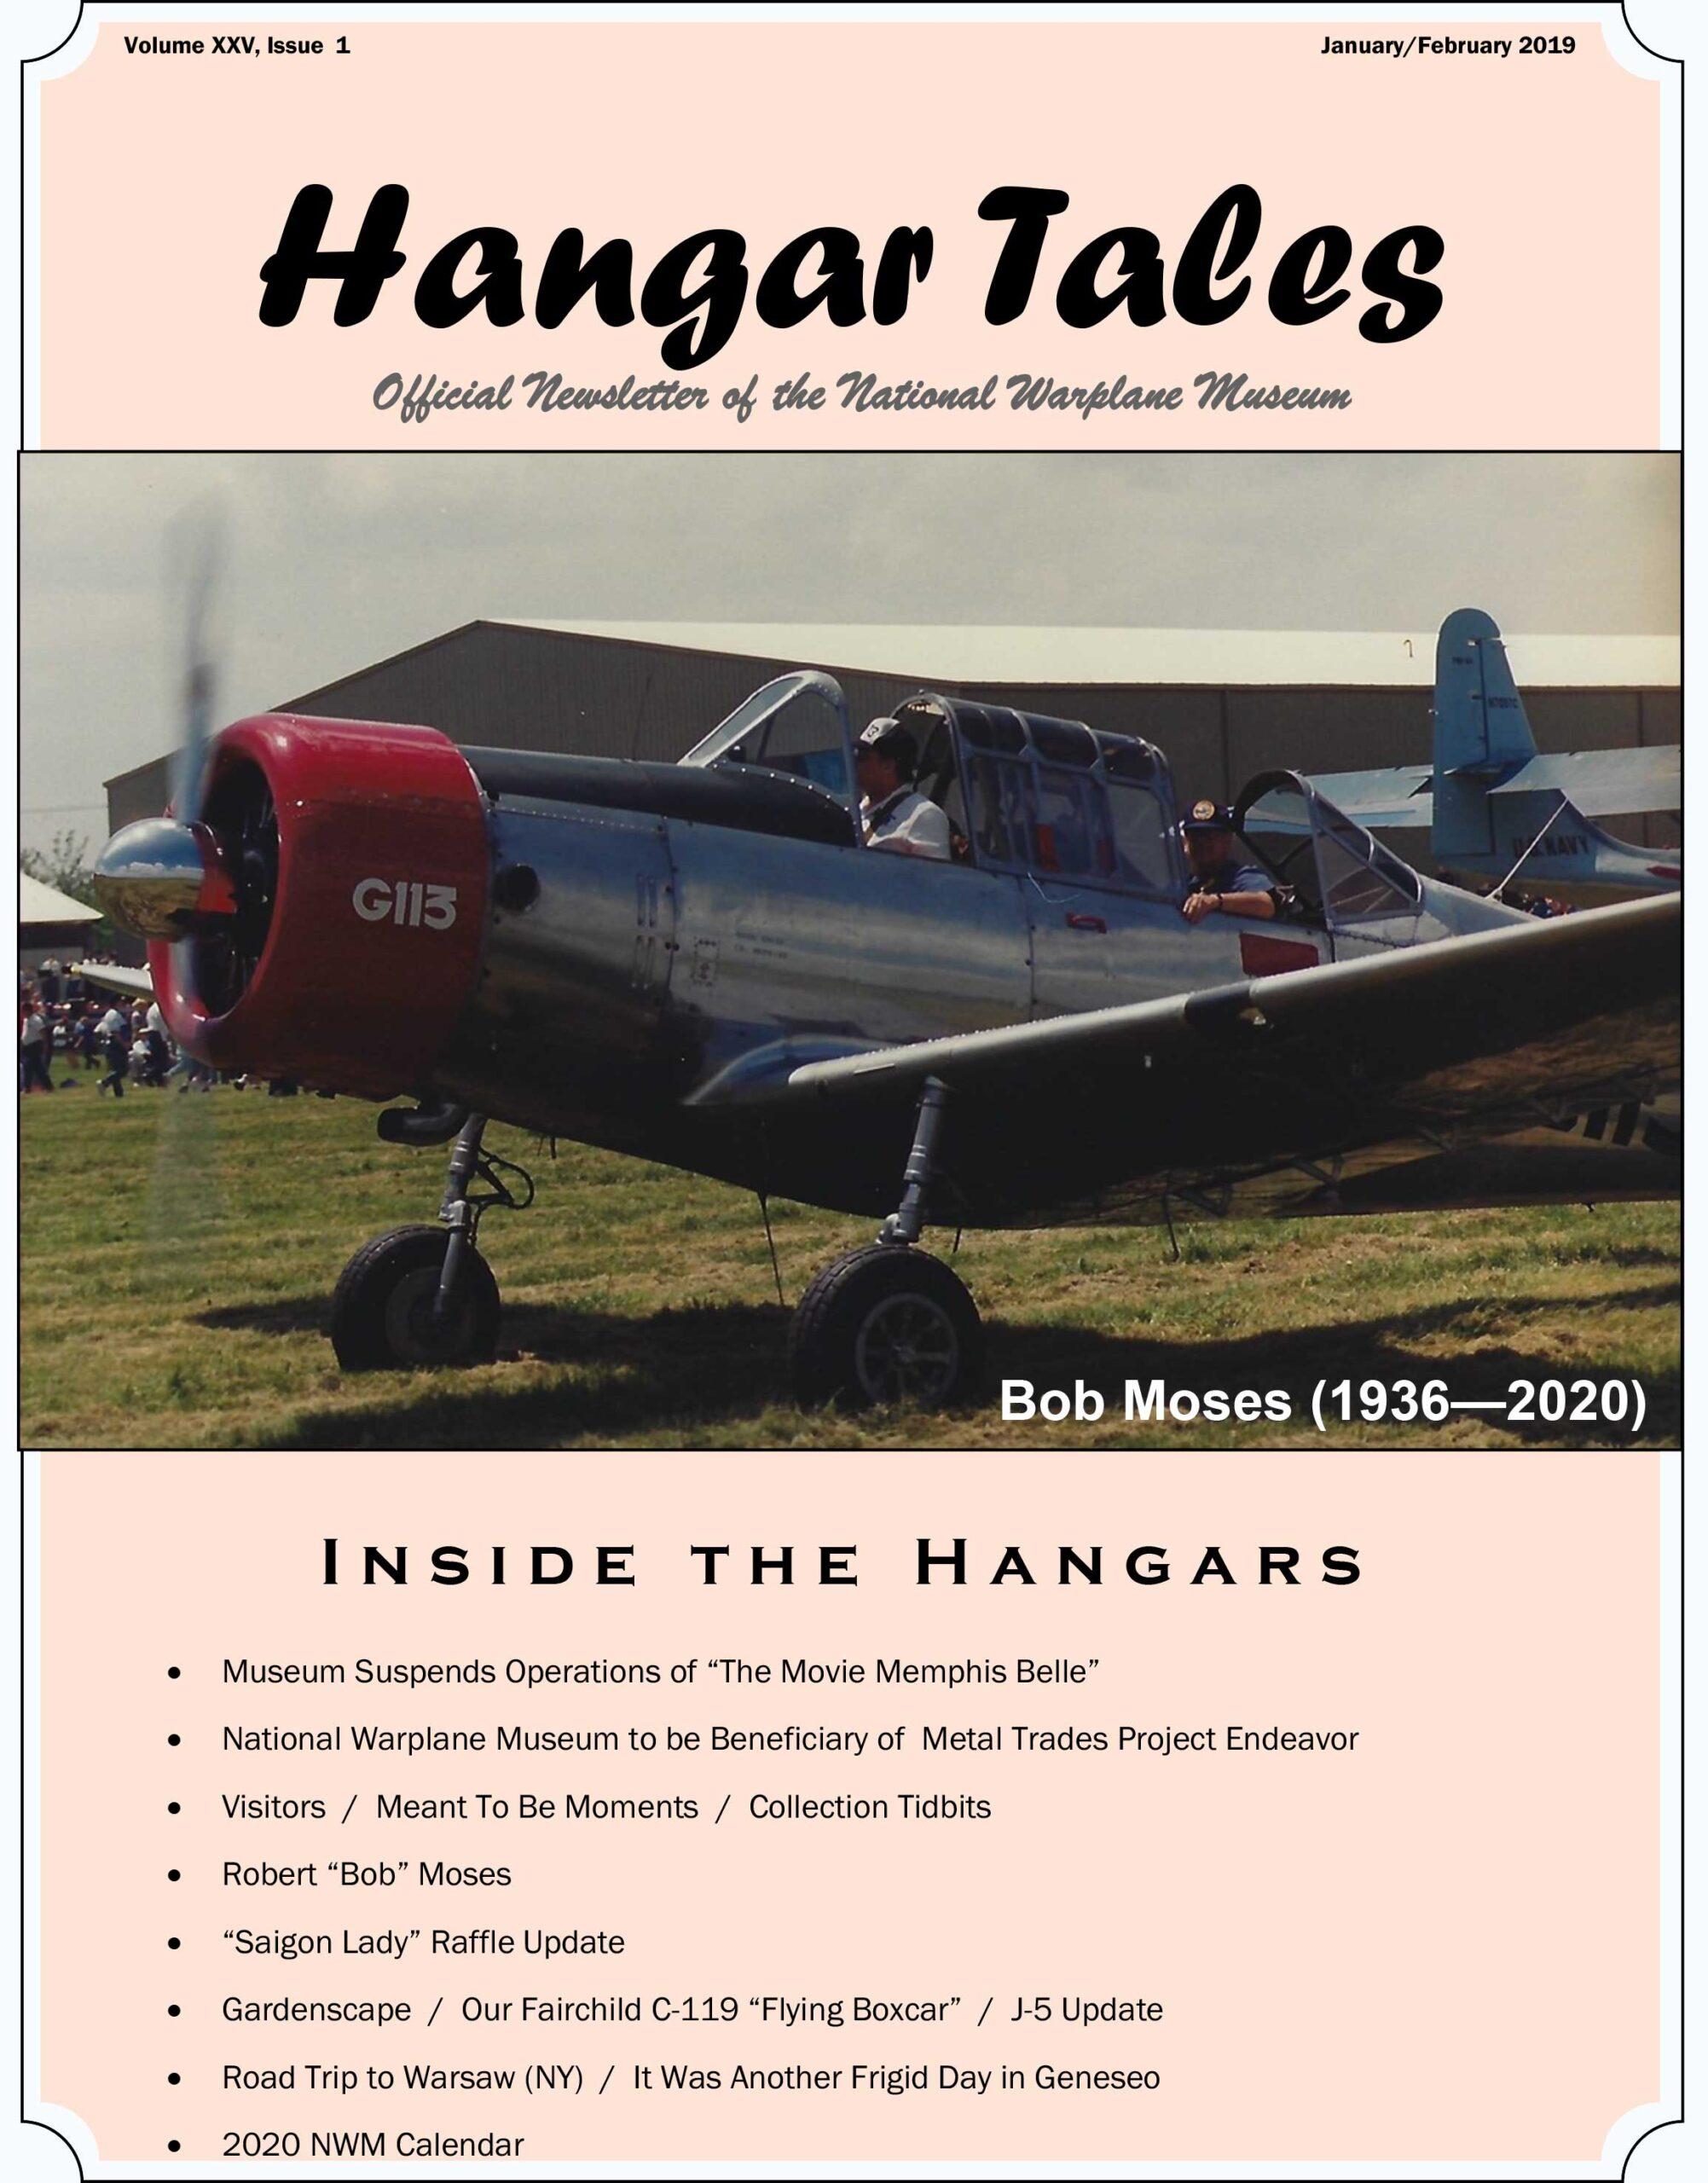 Hangar Tales